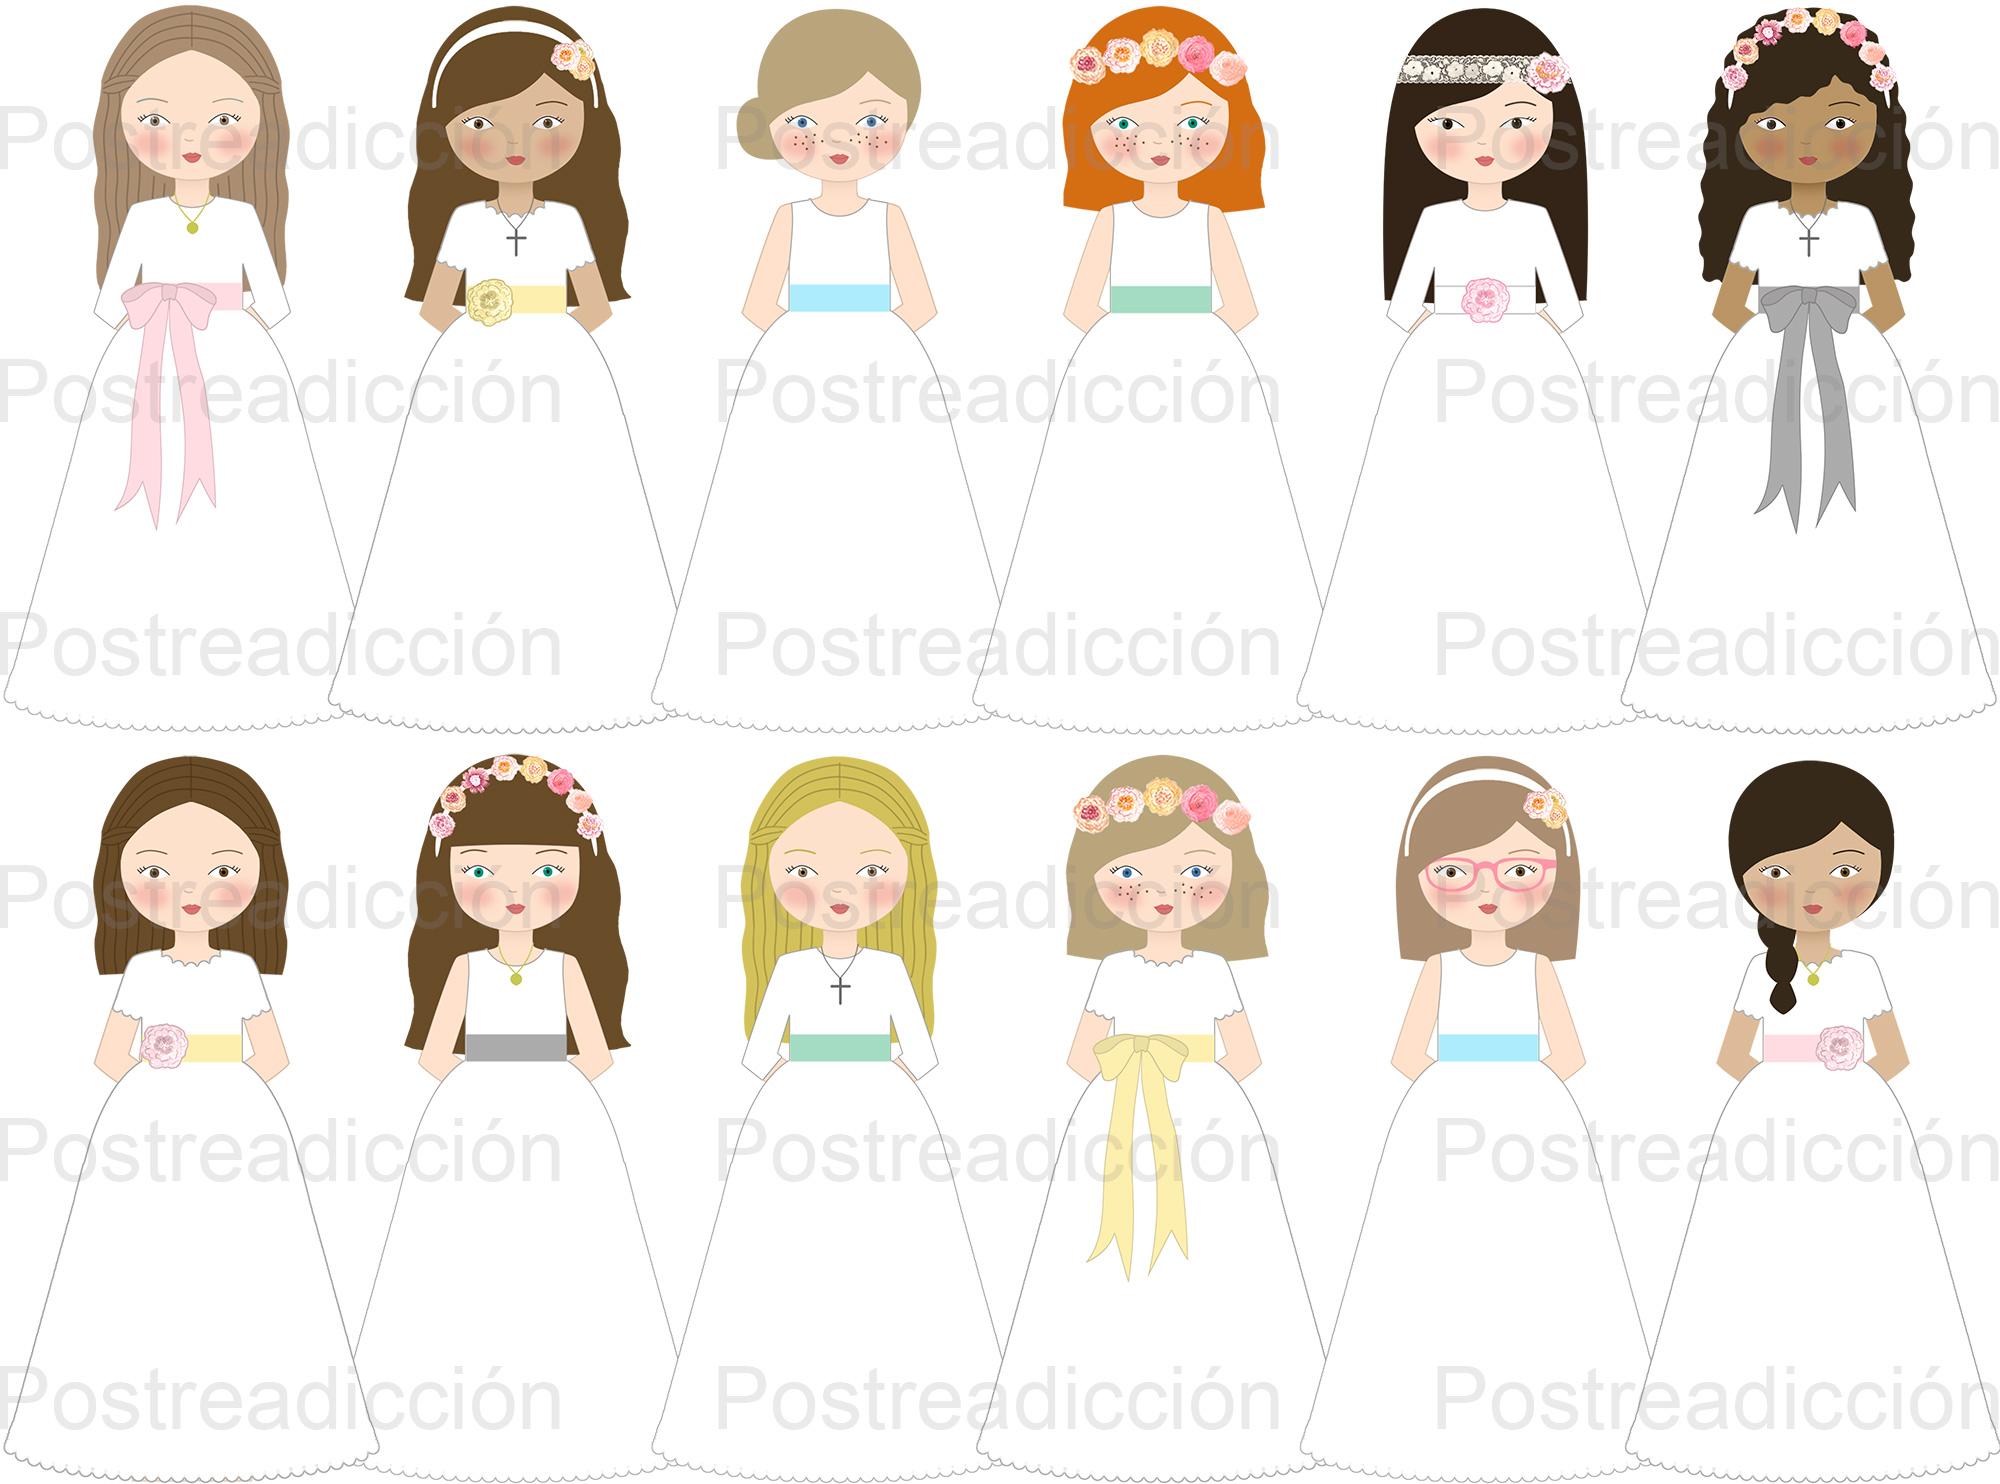 Imagen de producto: https://tienda.postreadiccion.com/img/articulos/secundarias6796-modelo-no-791-nina-de-comunion-carlota-1.jpg